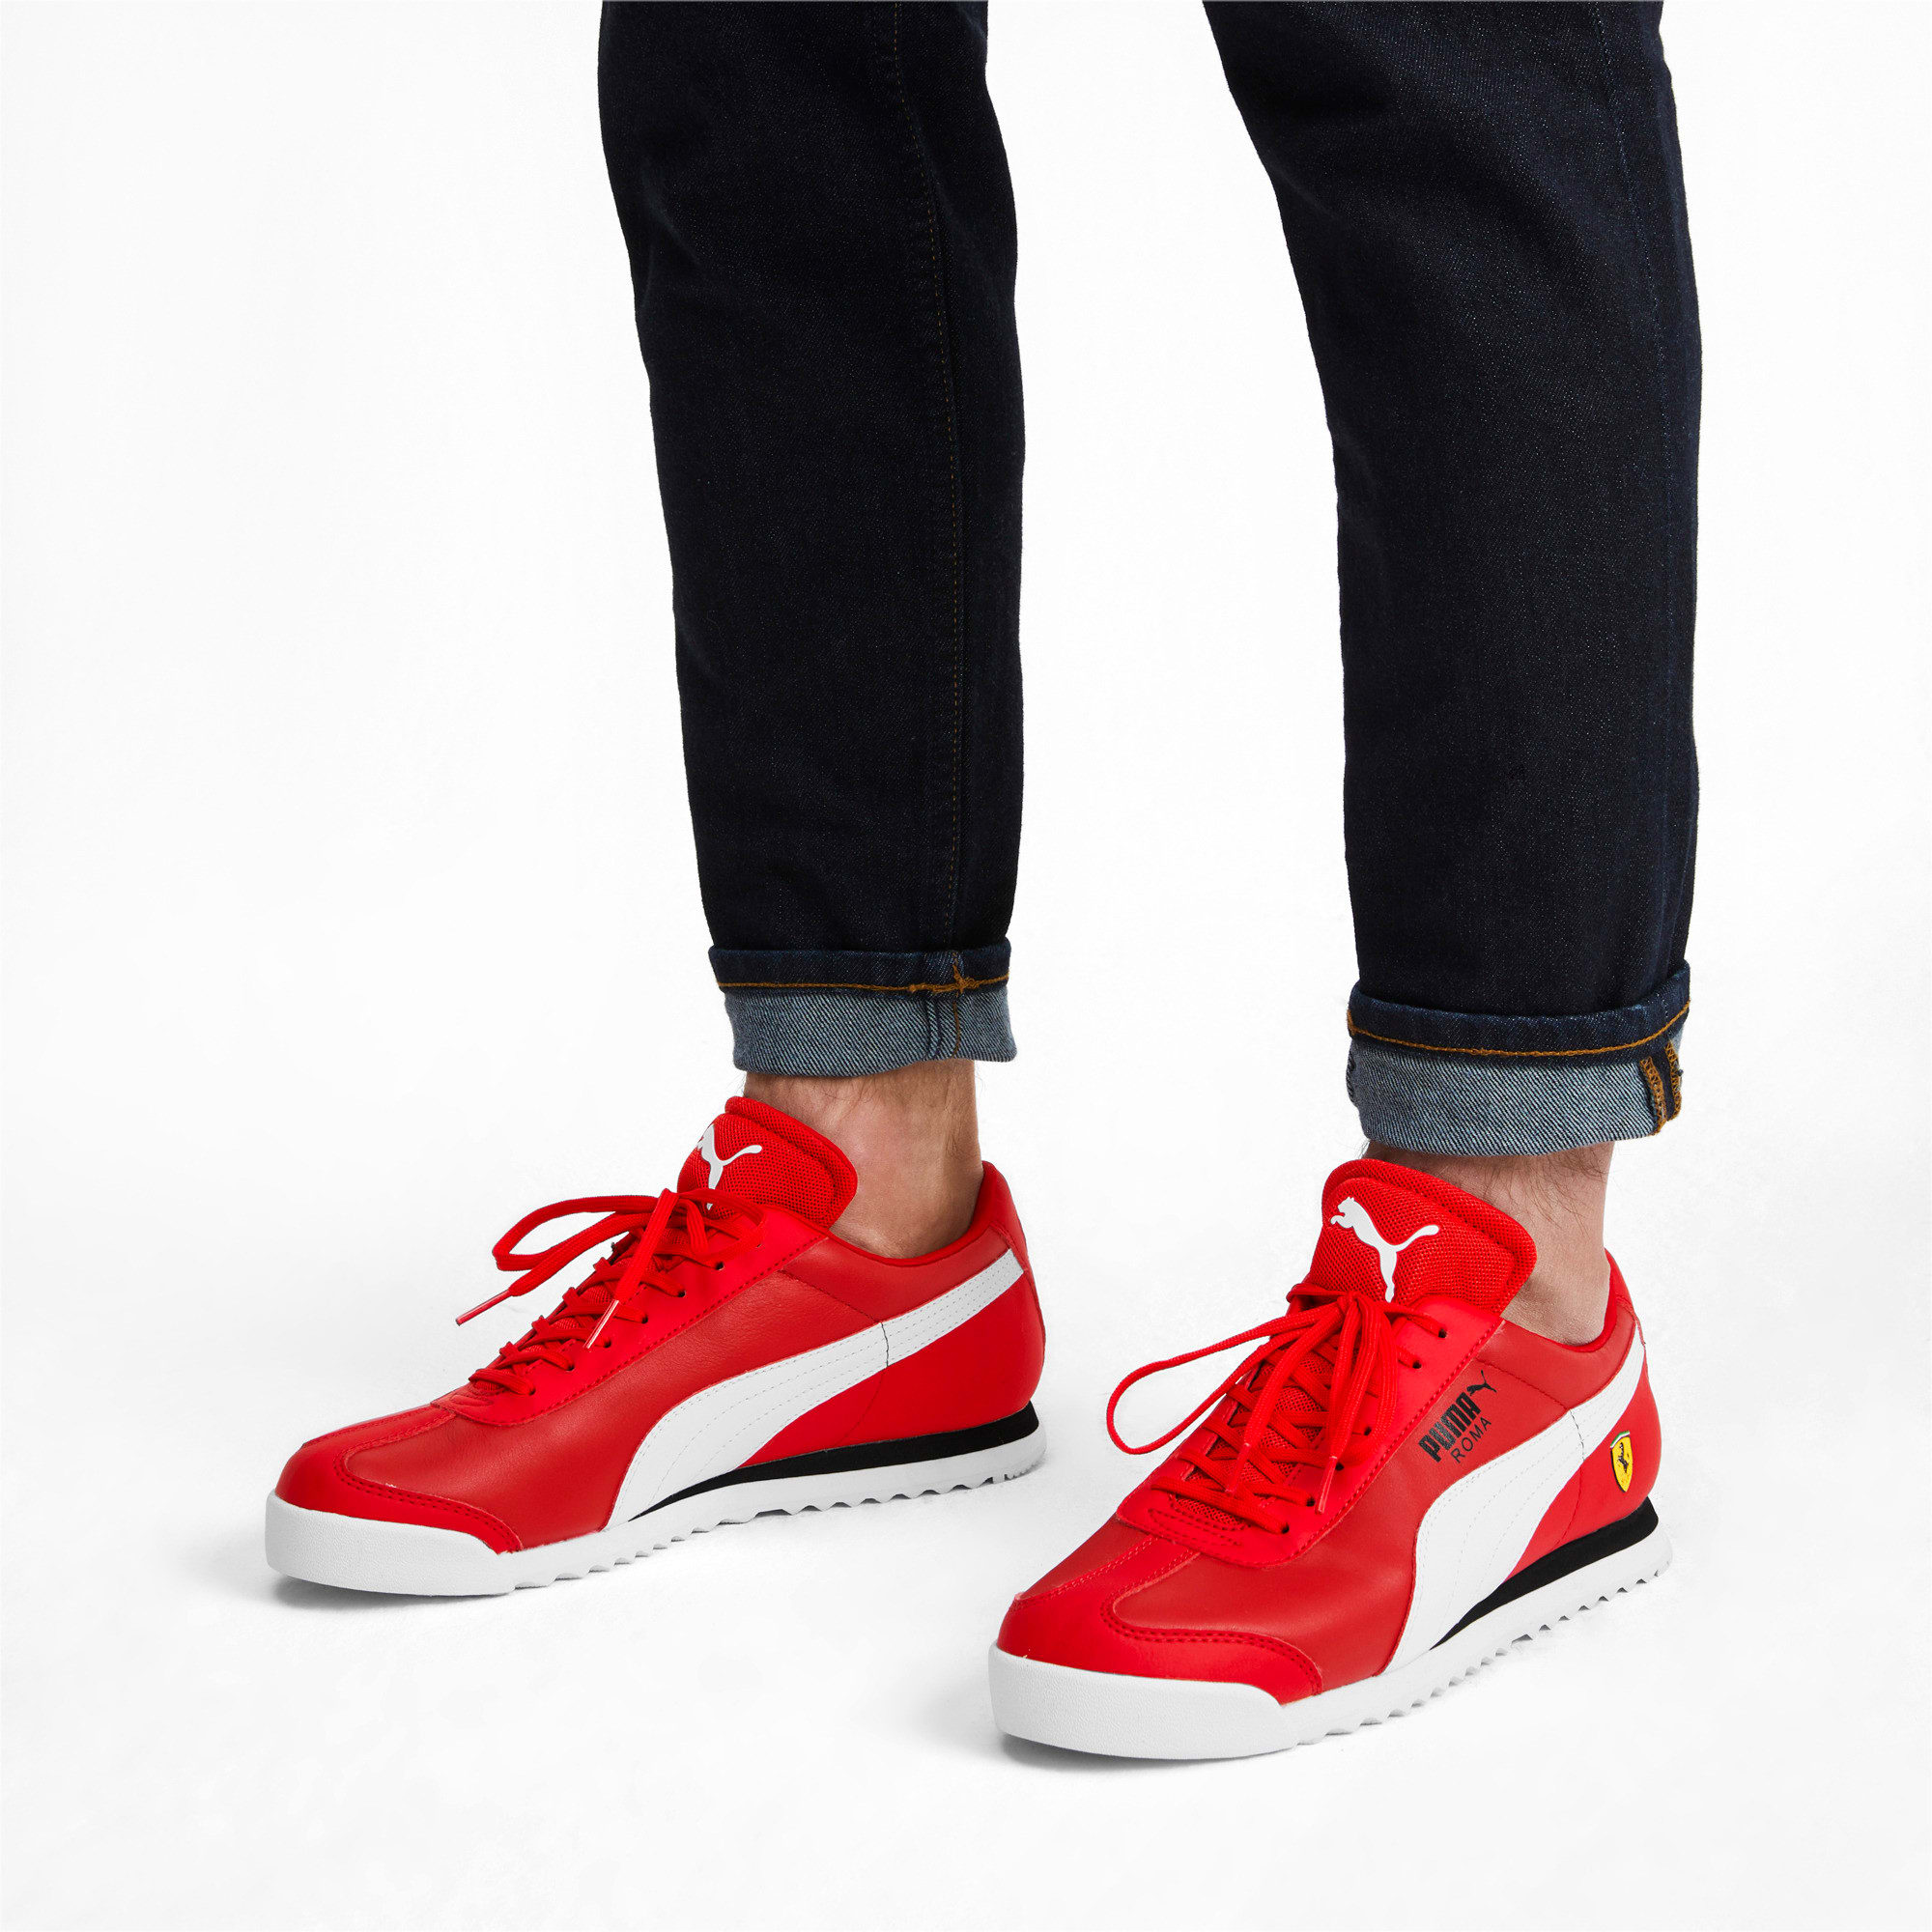 Thumbnail 2 of Scuderia Ferrari Roma Men's Sneakers, Rosso Corsa-White-Black, medium